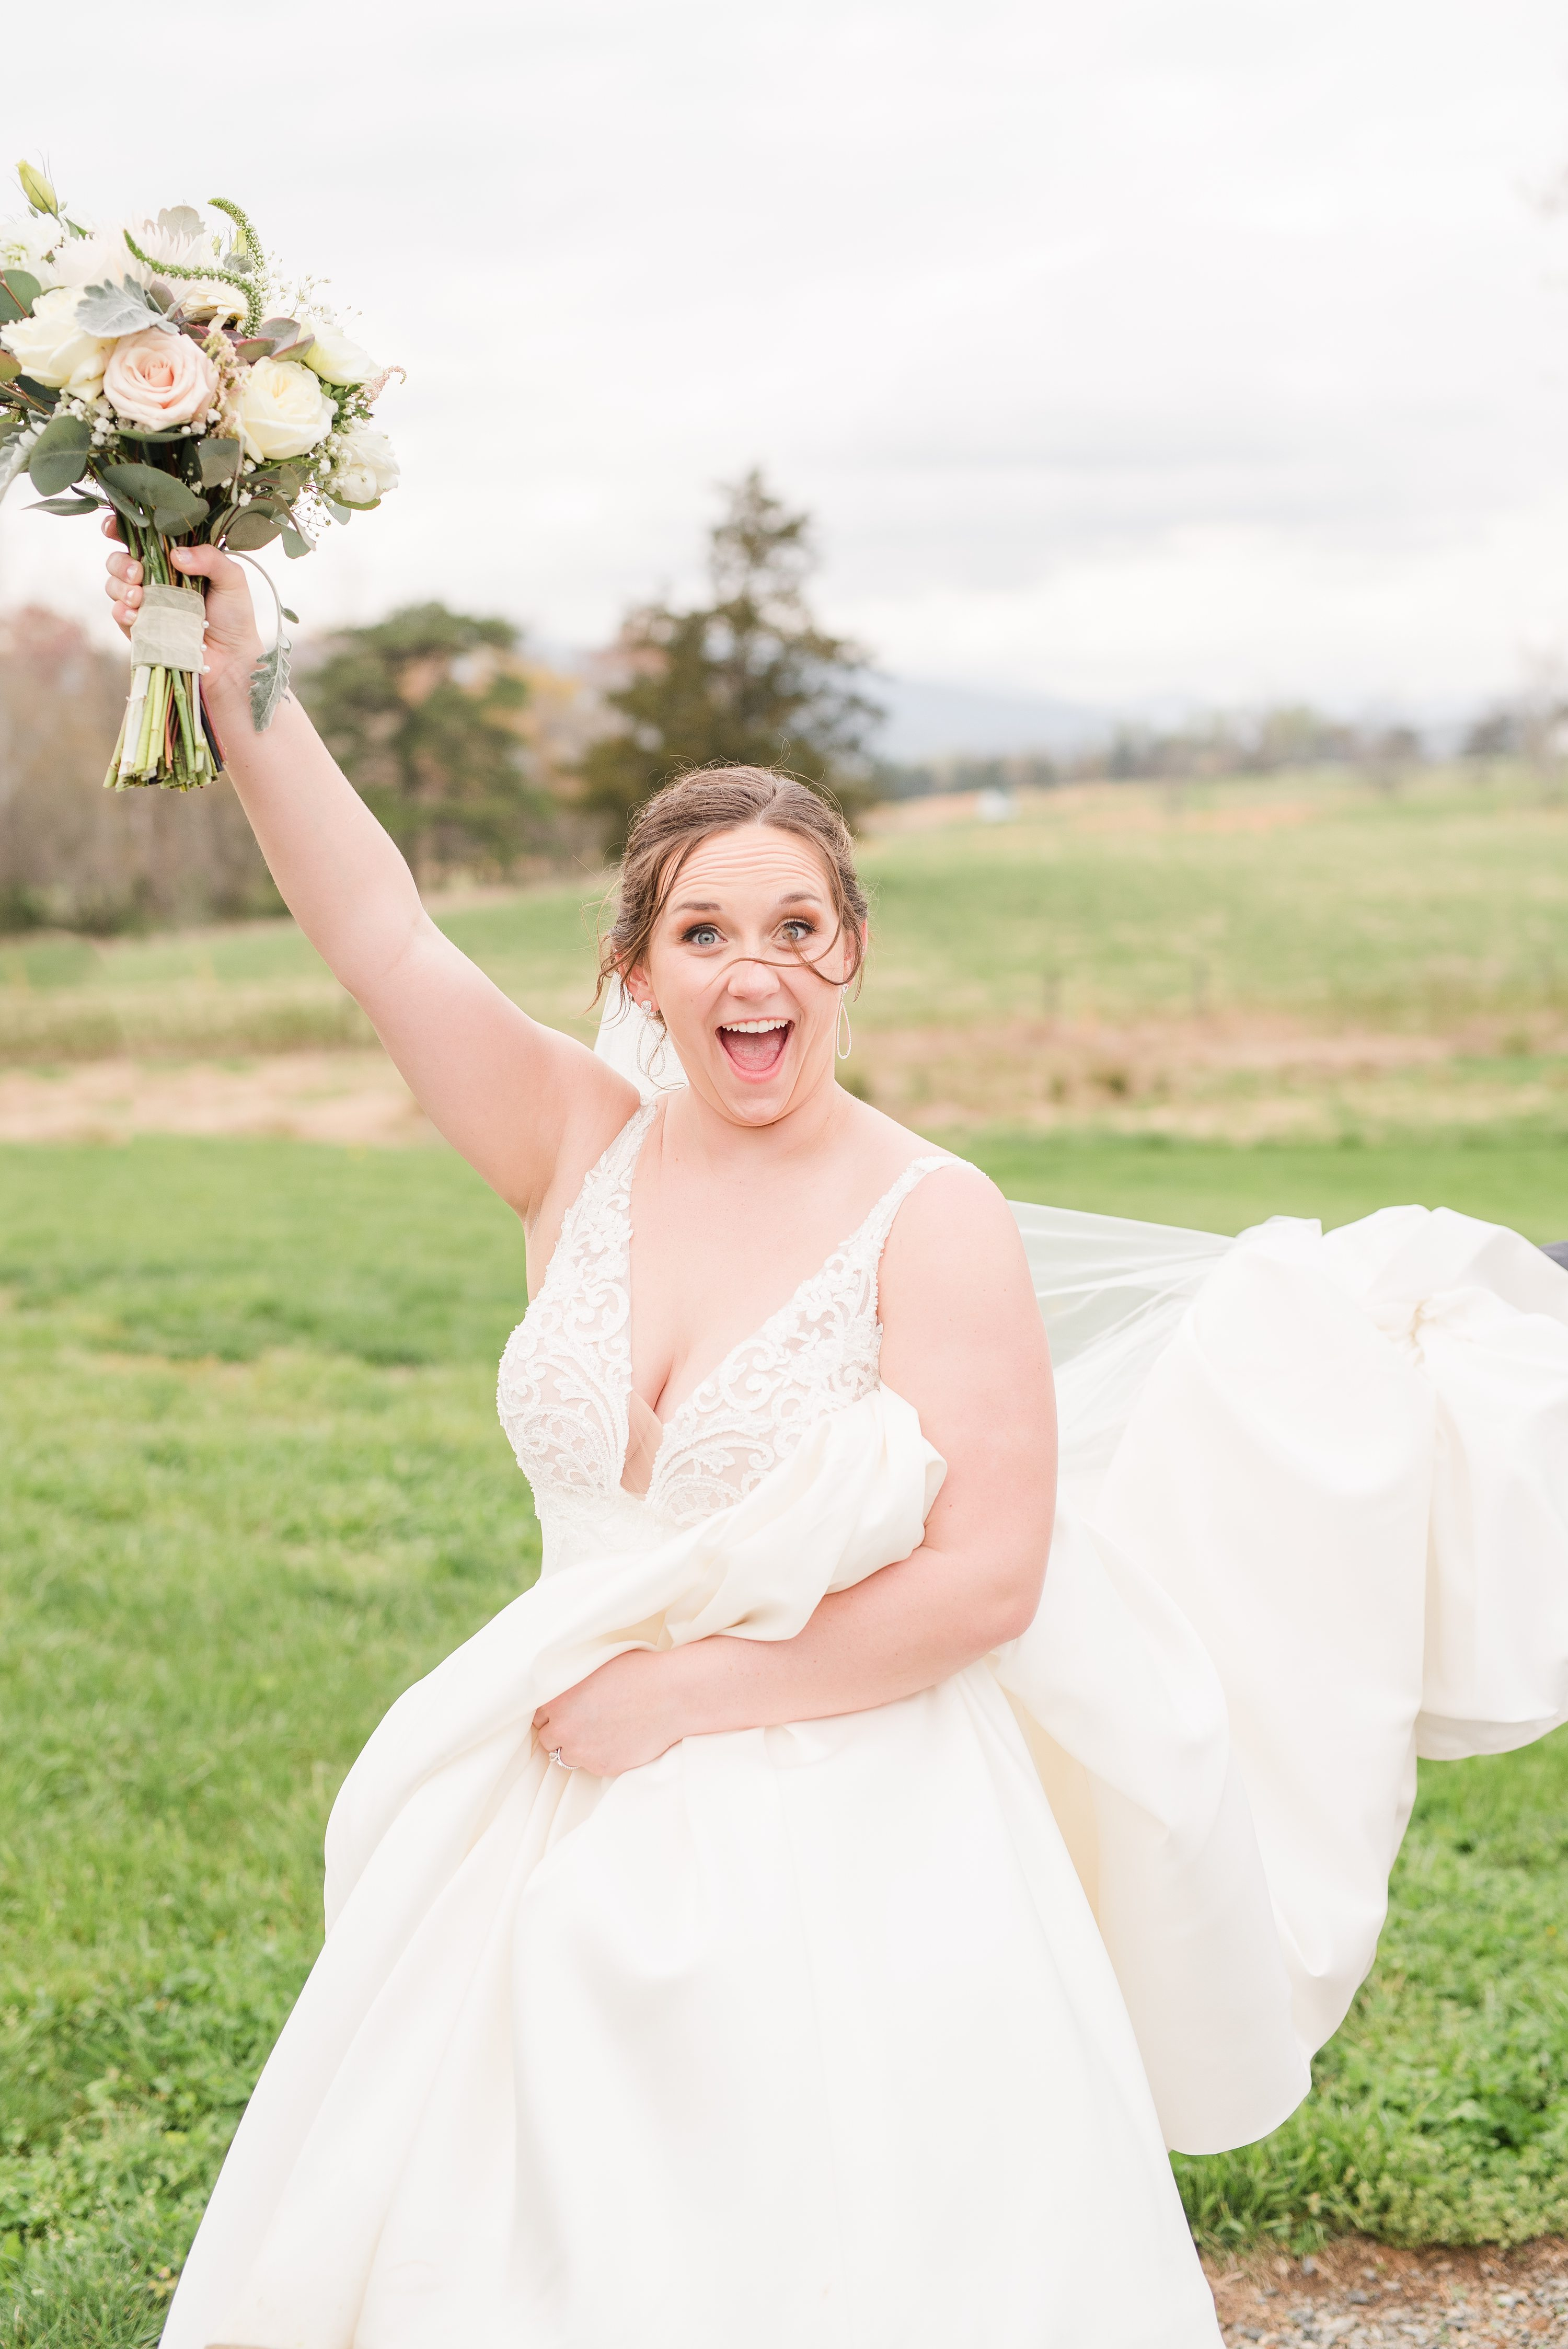 Southern Wedding,Barn at Edgewood,bride and groom,mountain wedding,edgewood barn